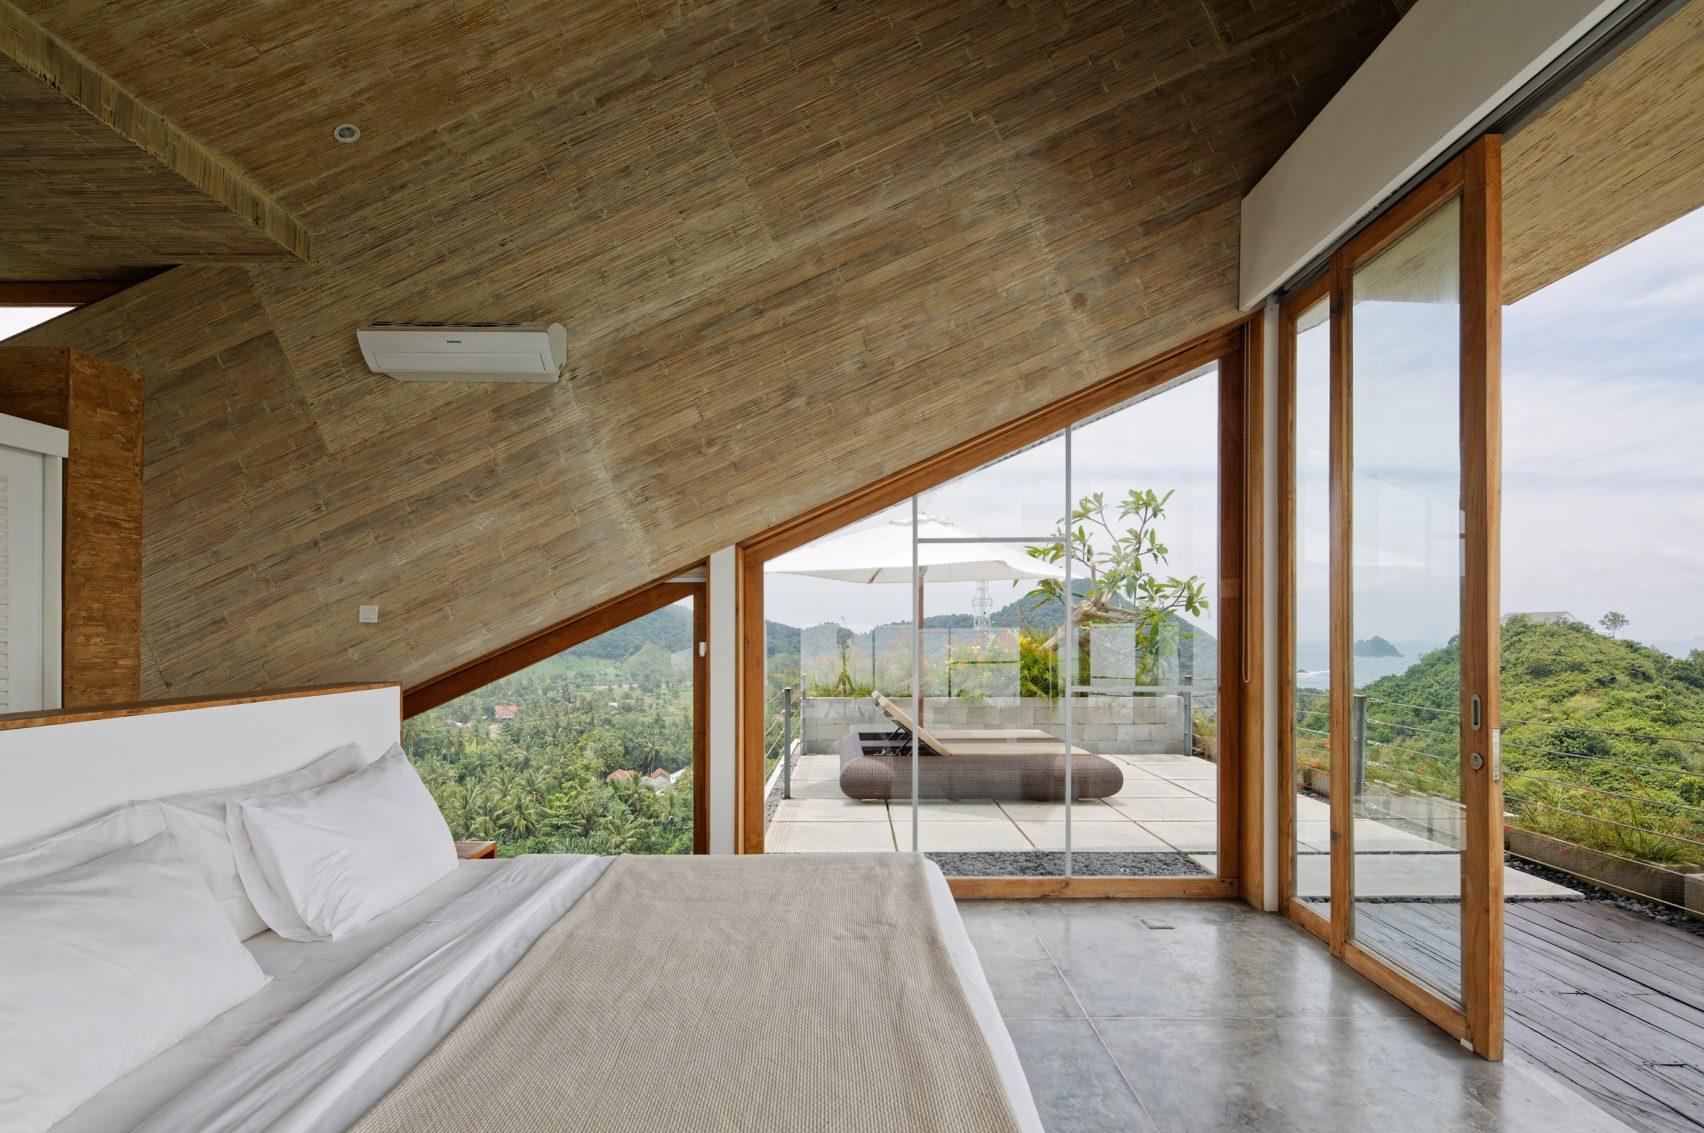 clay-house-budi-pradono-architects-architecture_dezeen_2364_col_4-1704x1133.jpg